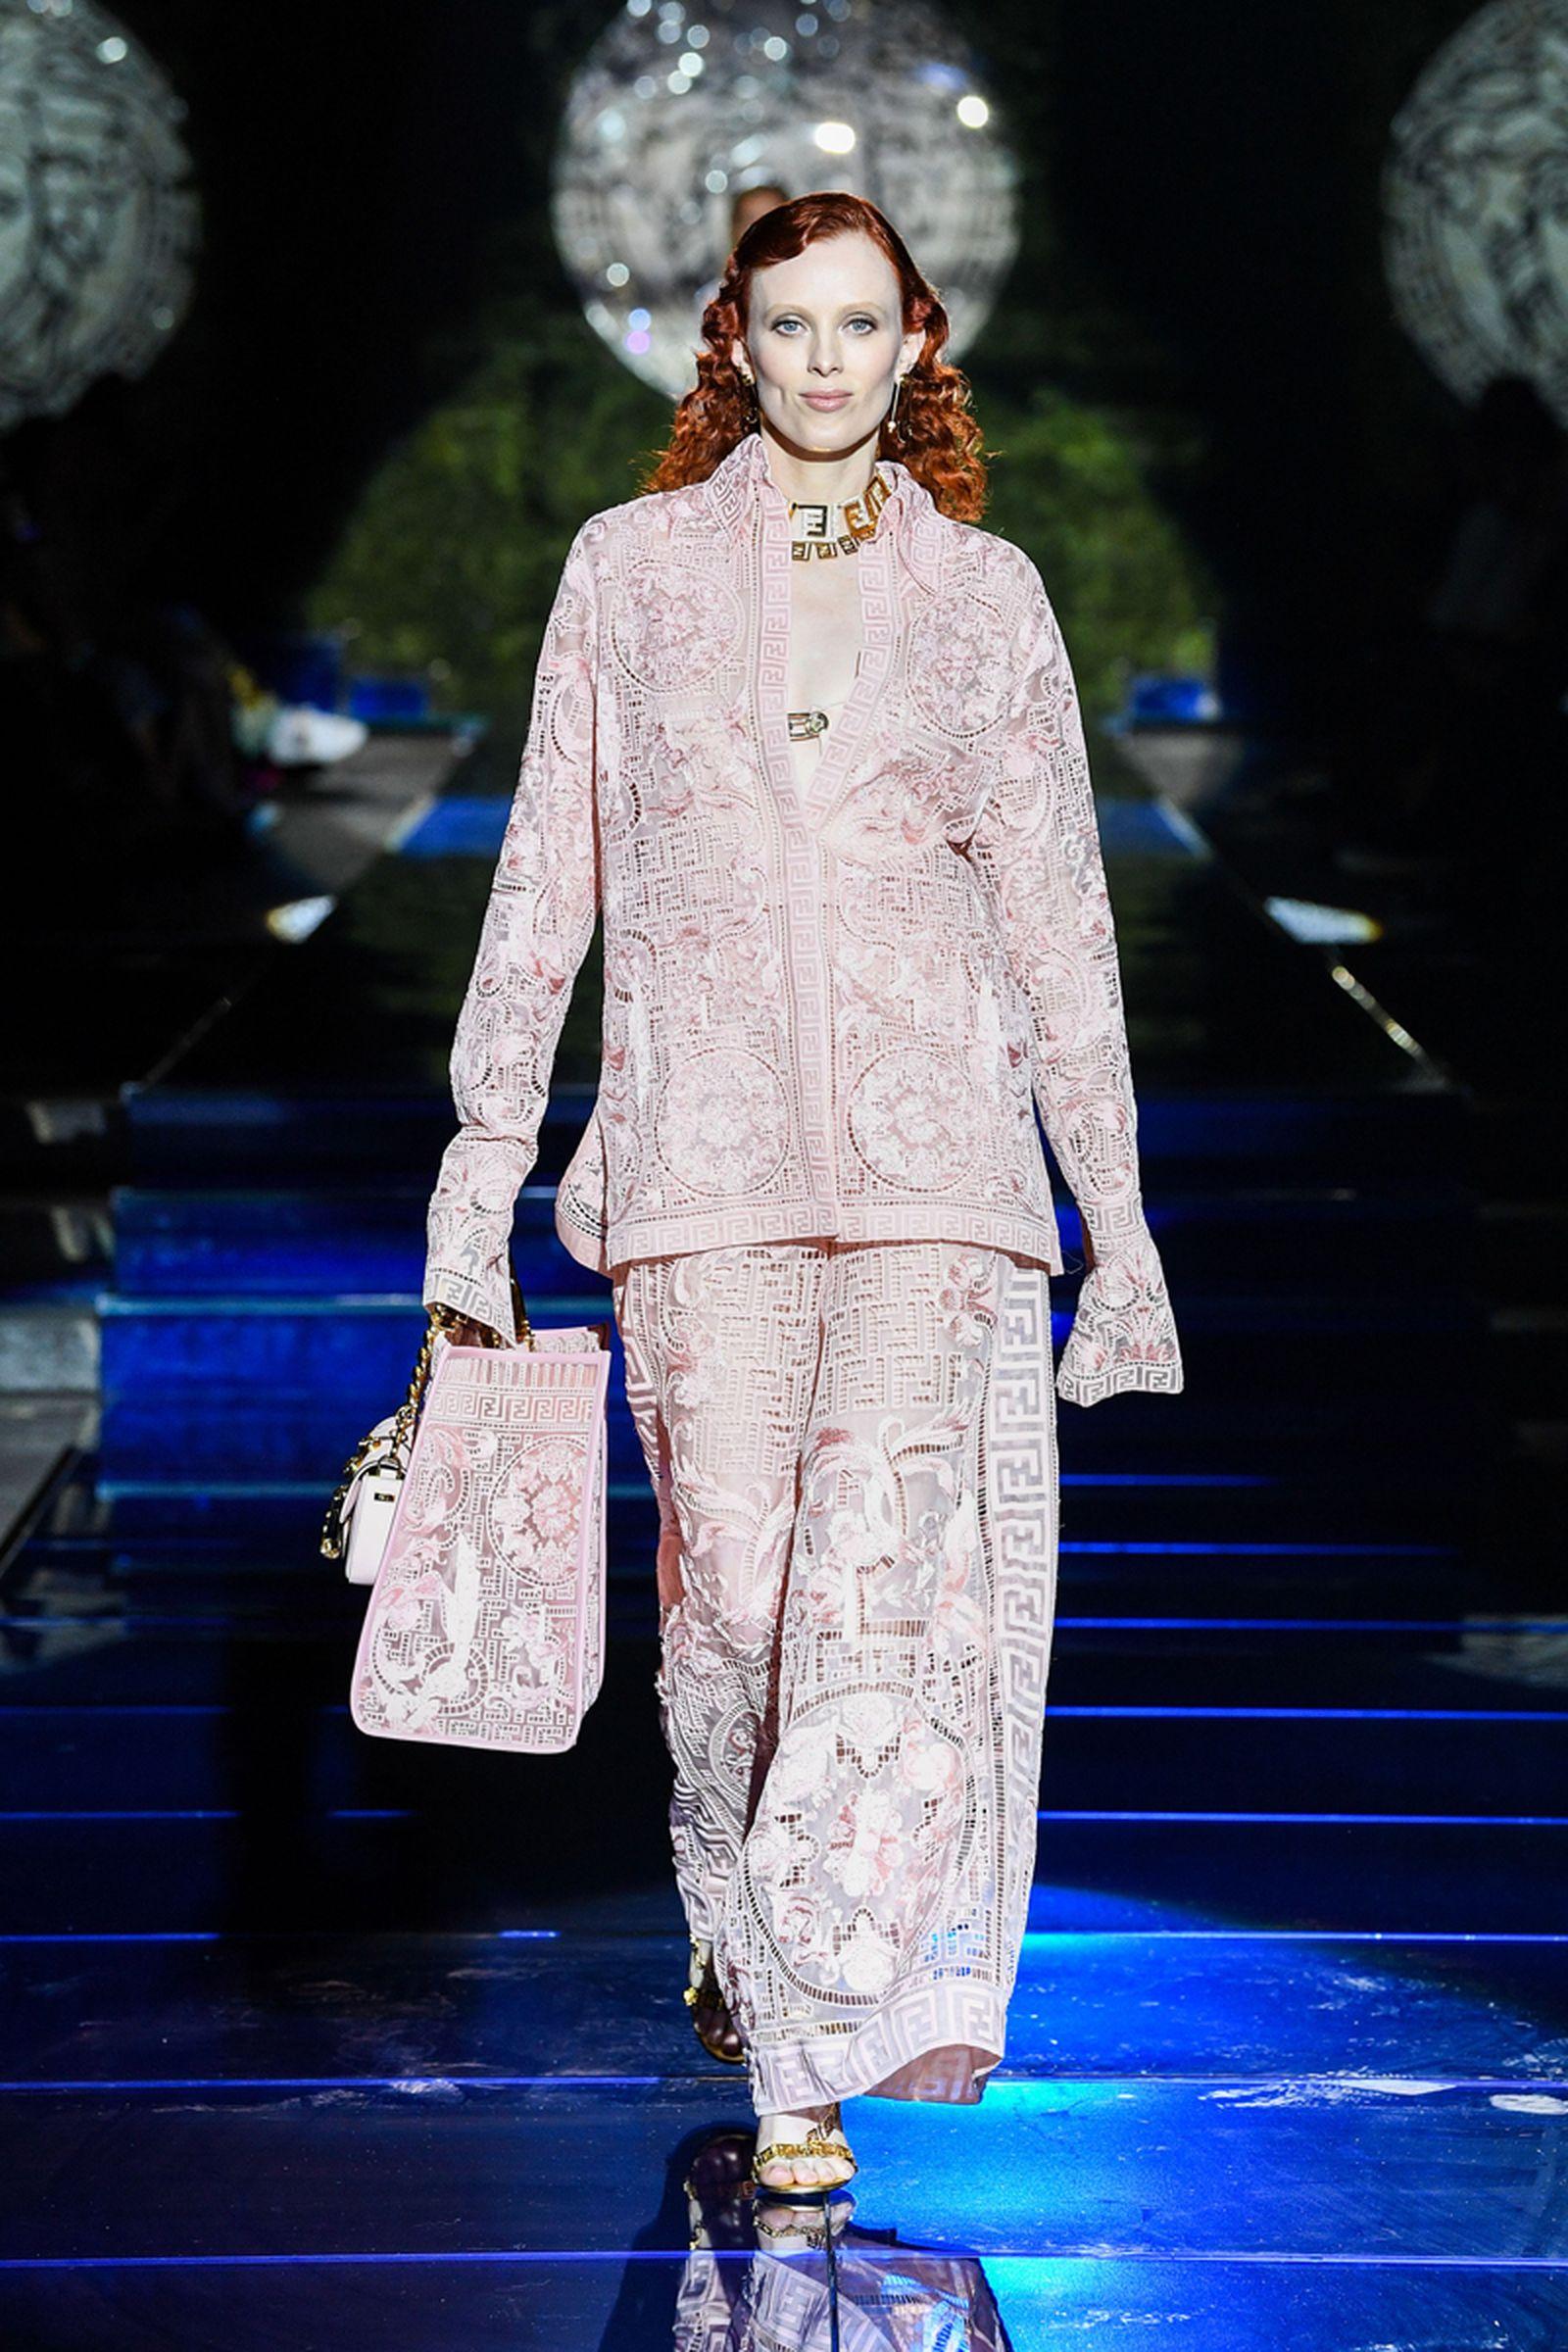 fendi versace fendace collab kim jones donatella swap collection watch lookbook runway milan